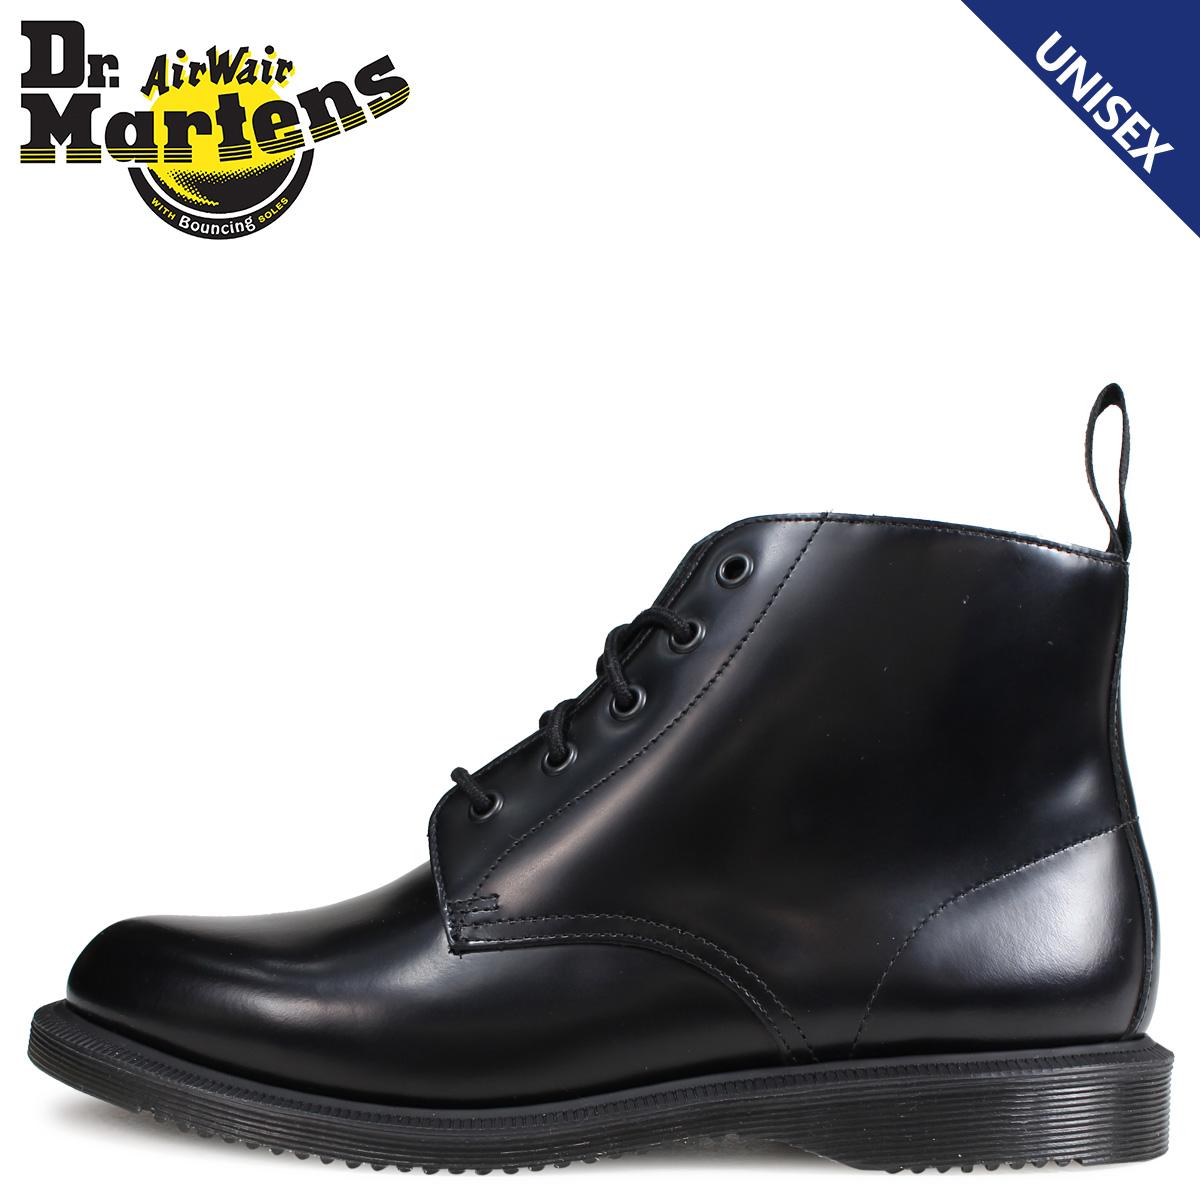 Dr.Martens ドクターマーチン 5ホール ブーツ メンズ レディース EMMELINE KENSINGTON 5EYE BOOT ブラック R16701001